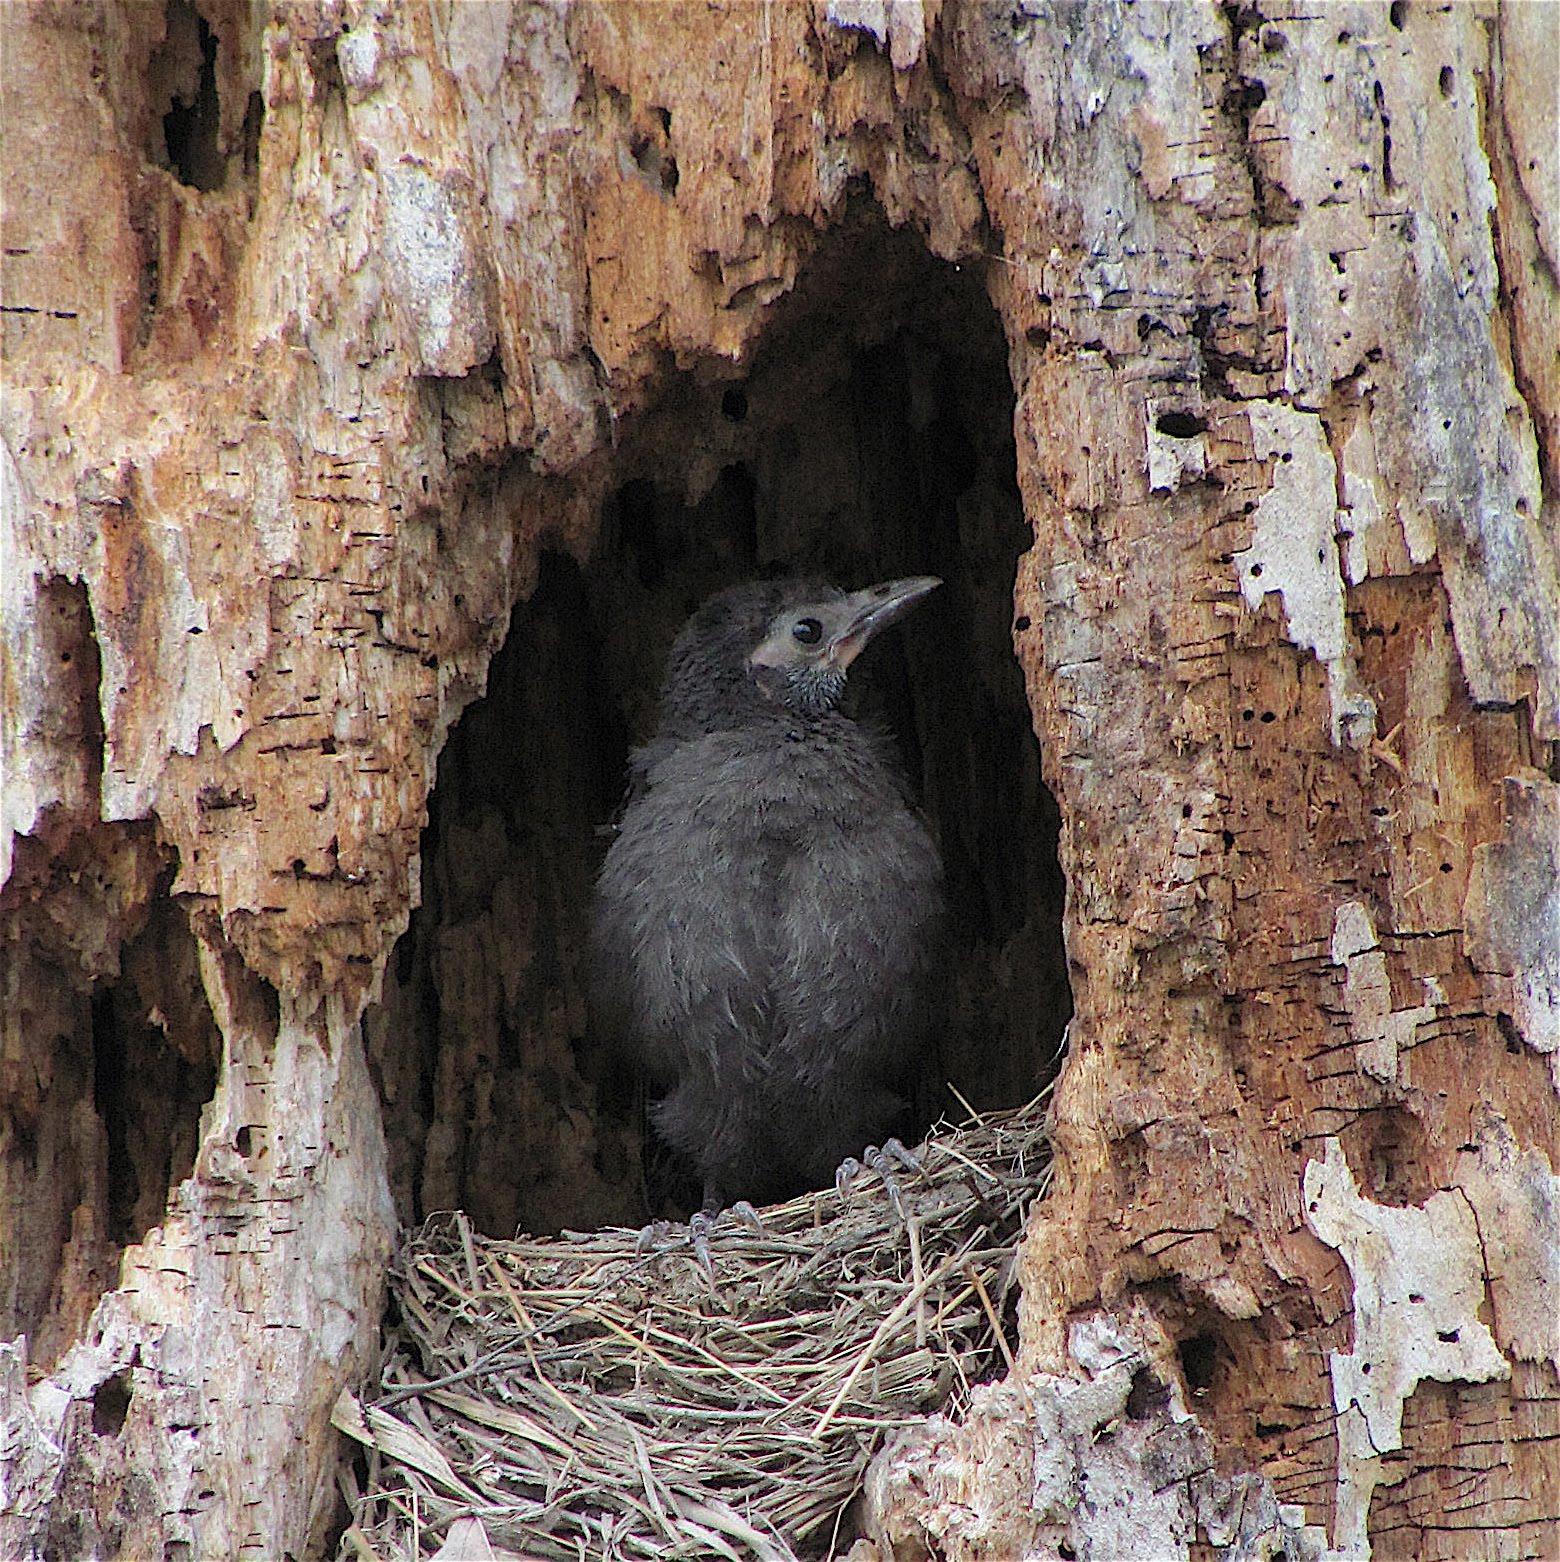 fledgling grackle - photo #41